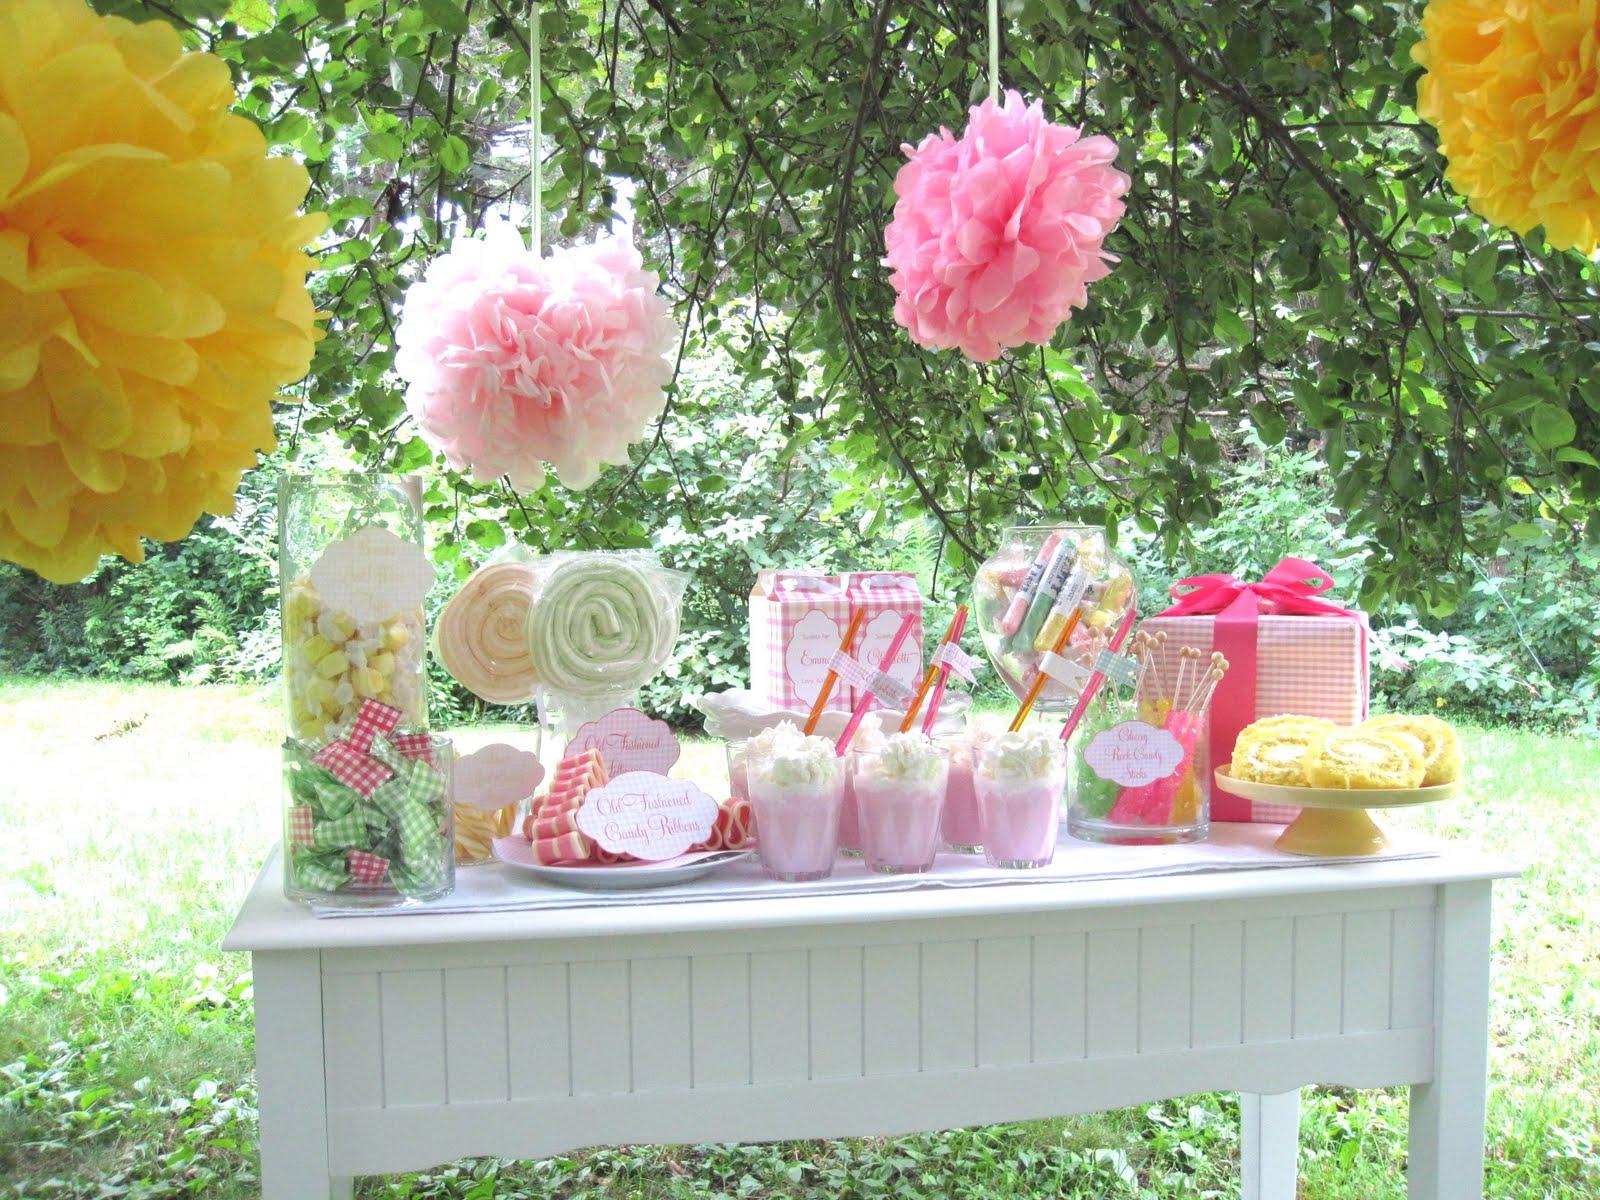 Kate landers events llc gingham sweet table - Decoracion fiesta jardin ...